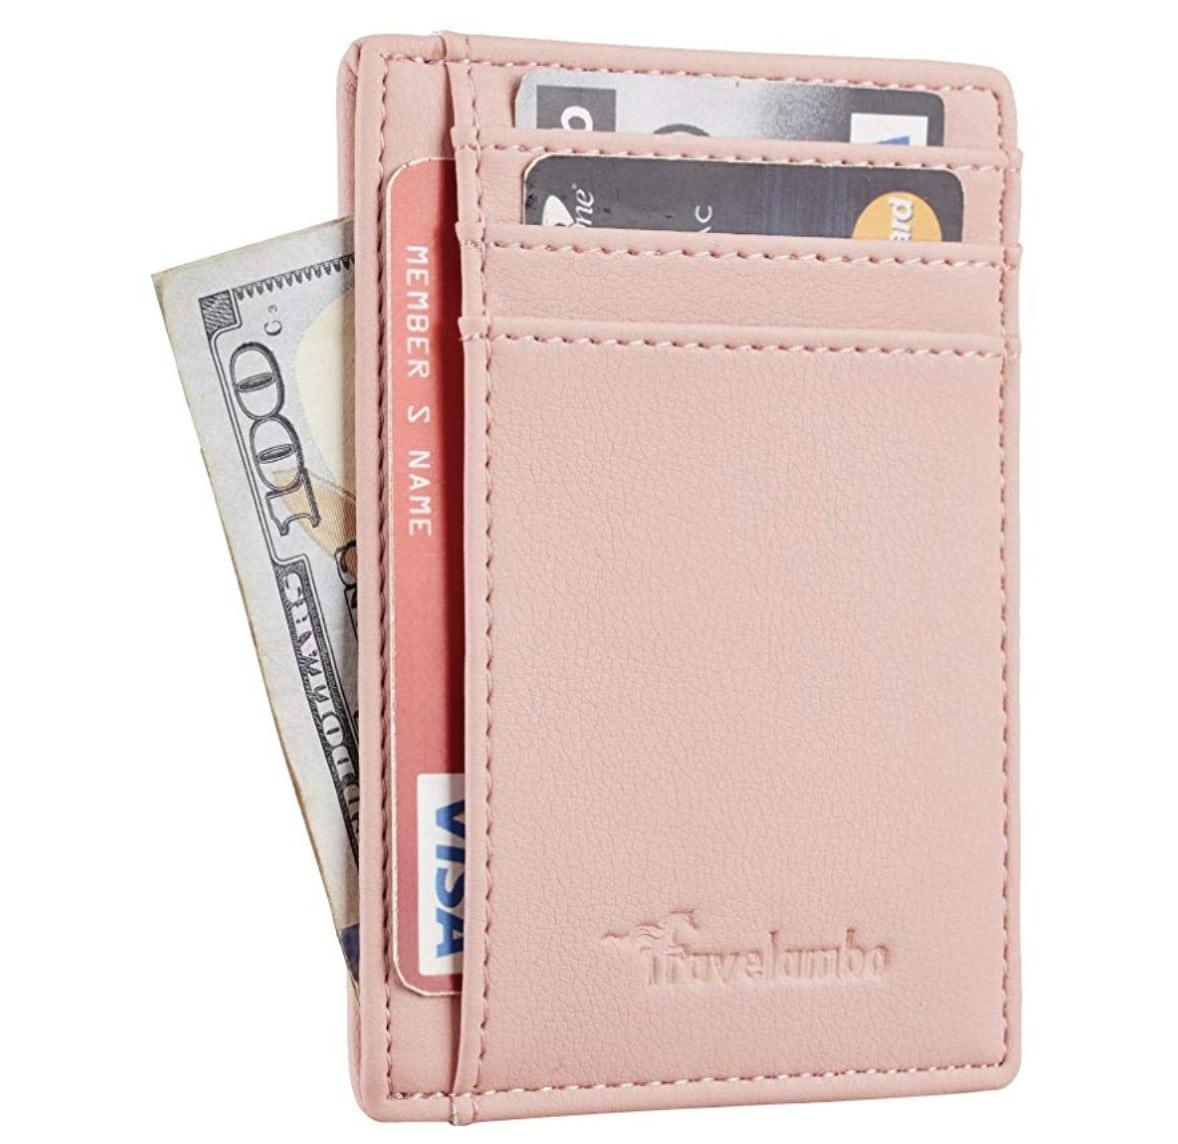 minimalist-wallet-travelambo